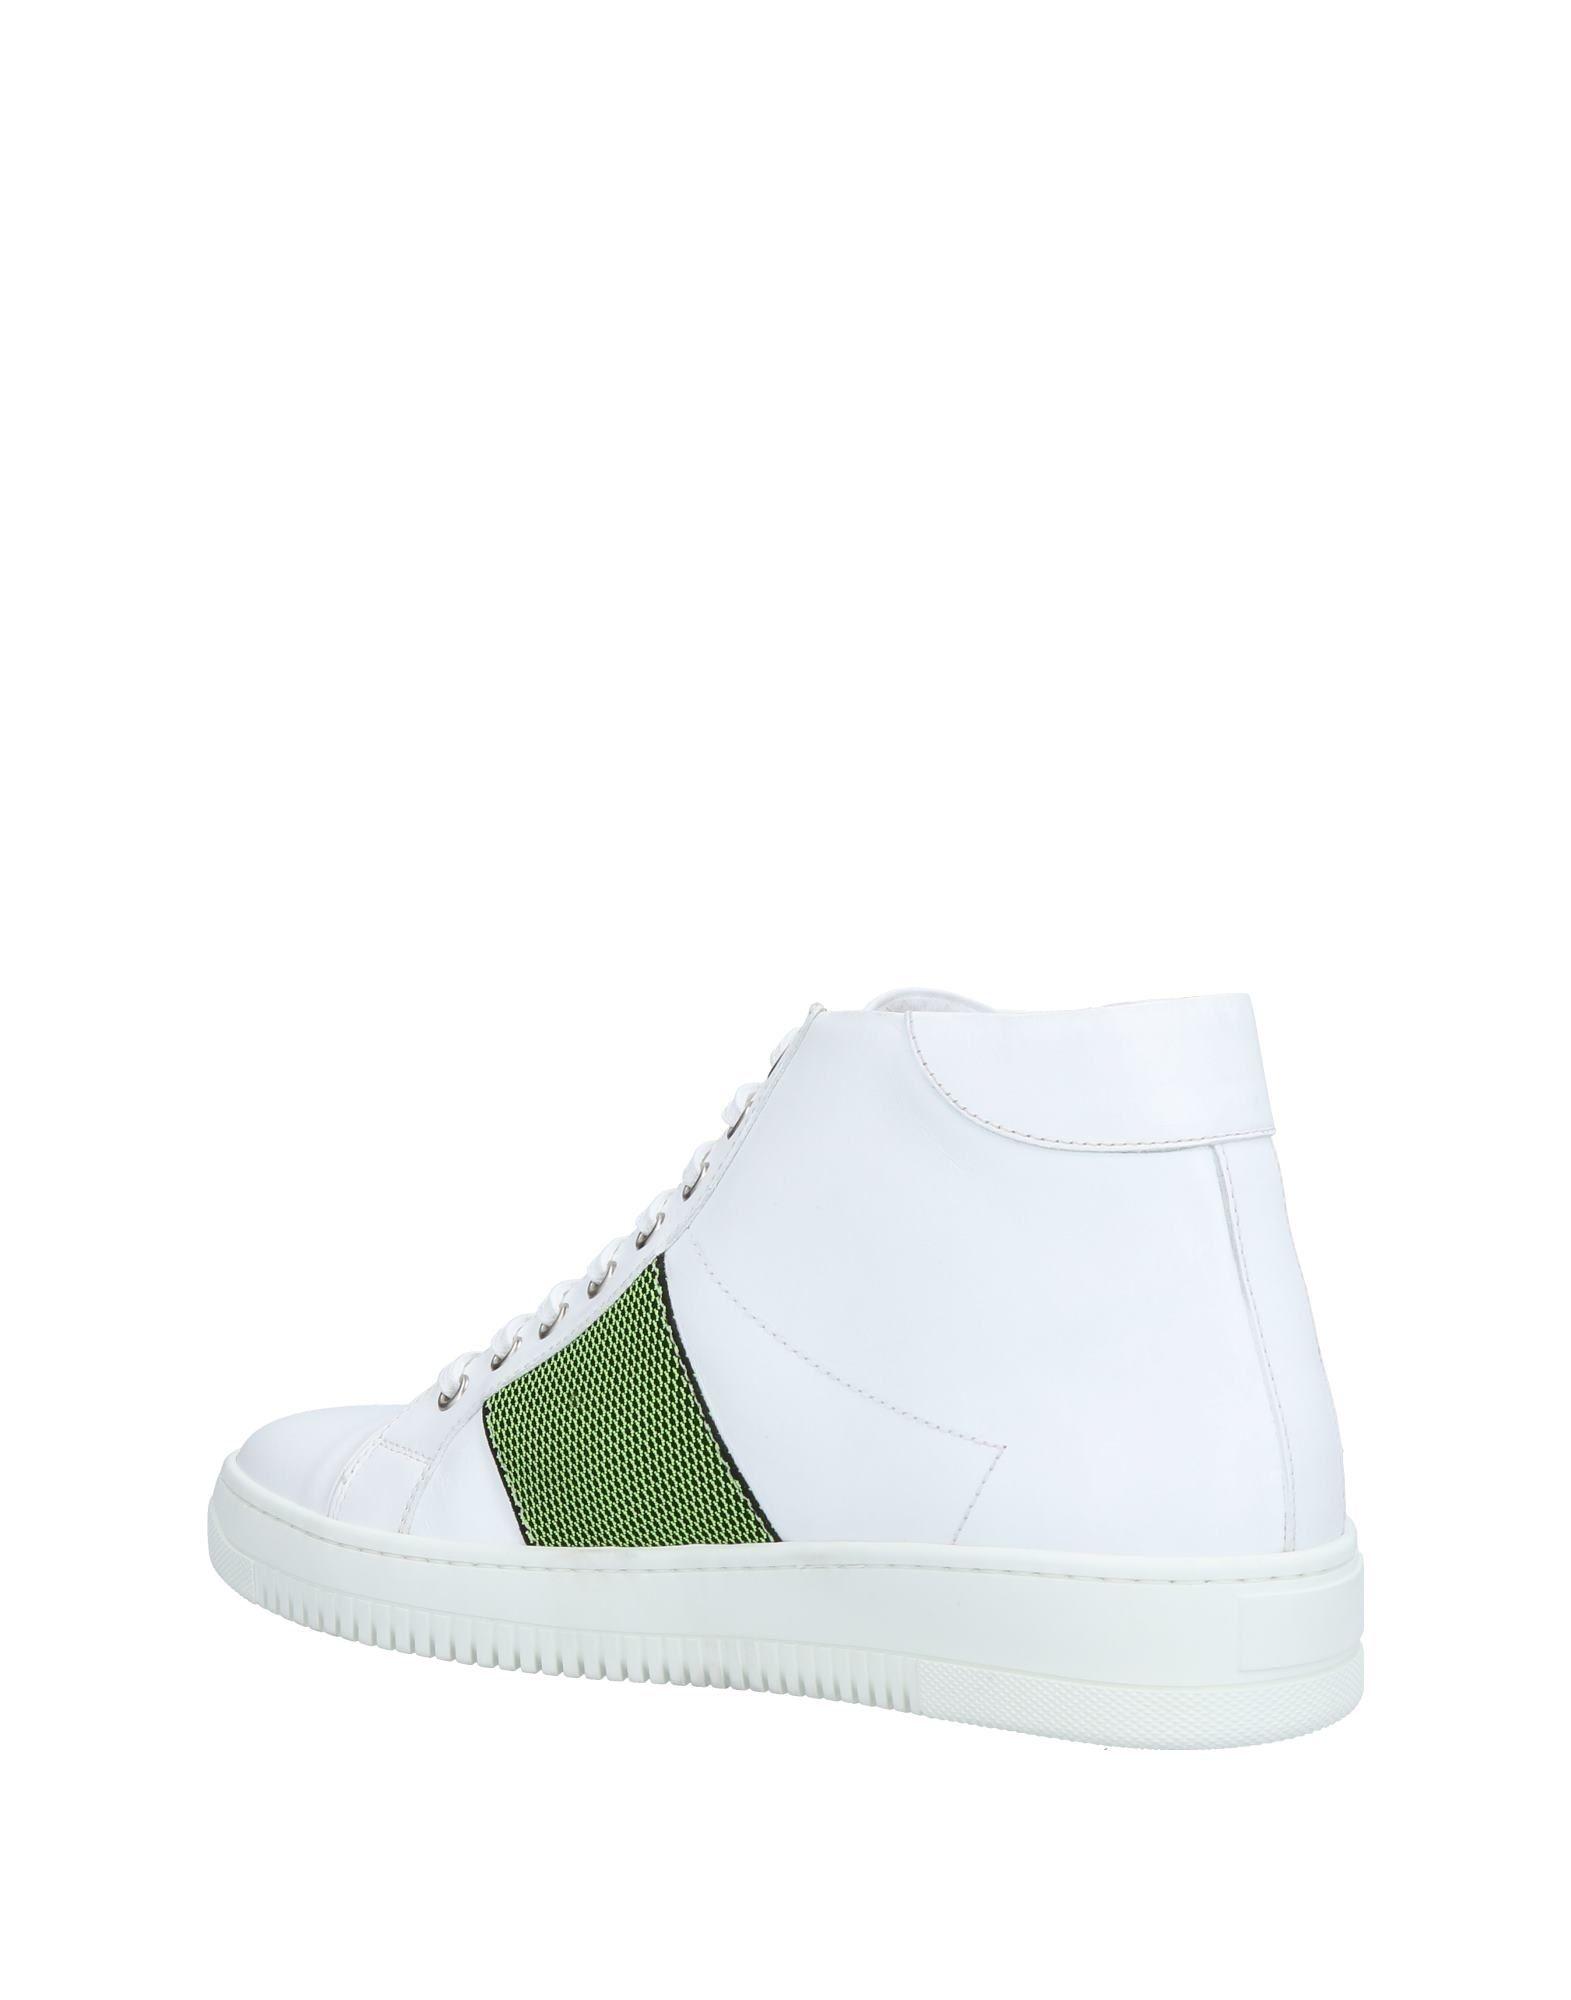 Patrizia Pepe Sneakers Herren   11492148CM 5c6cc7